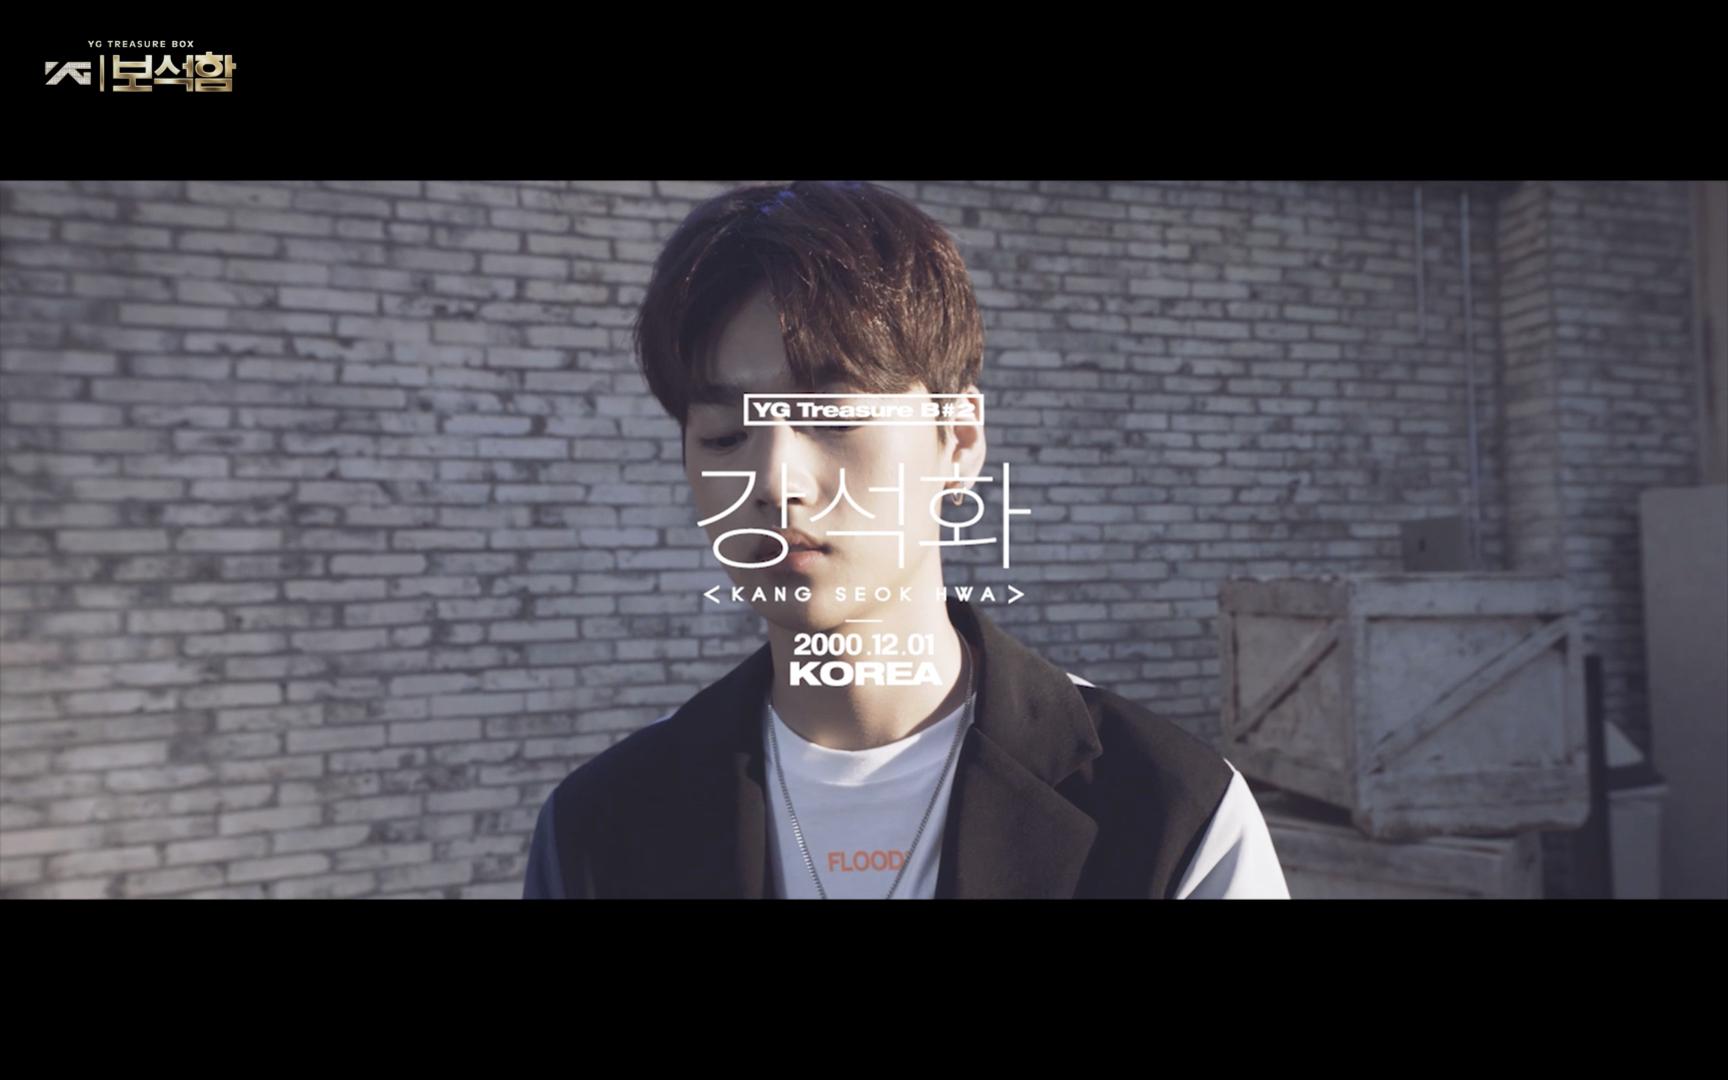 YG보석함ㅣB#2 강석화 <KANG SEOKHWA> #인터뷰+퍼포먼스